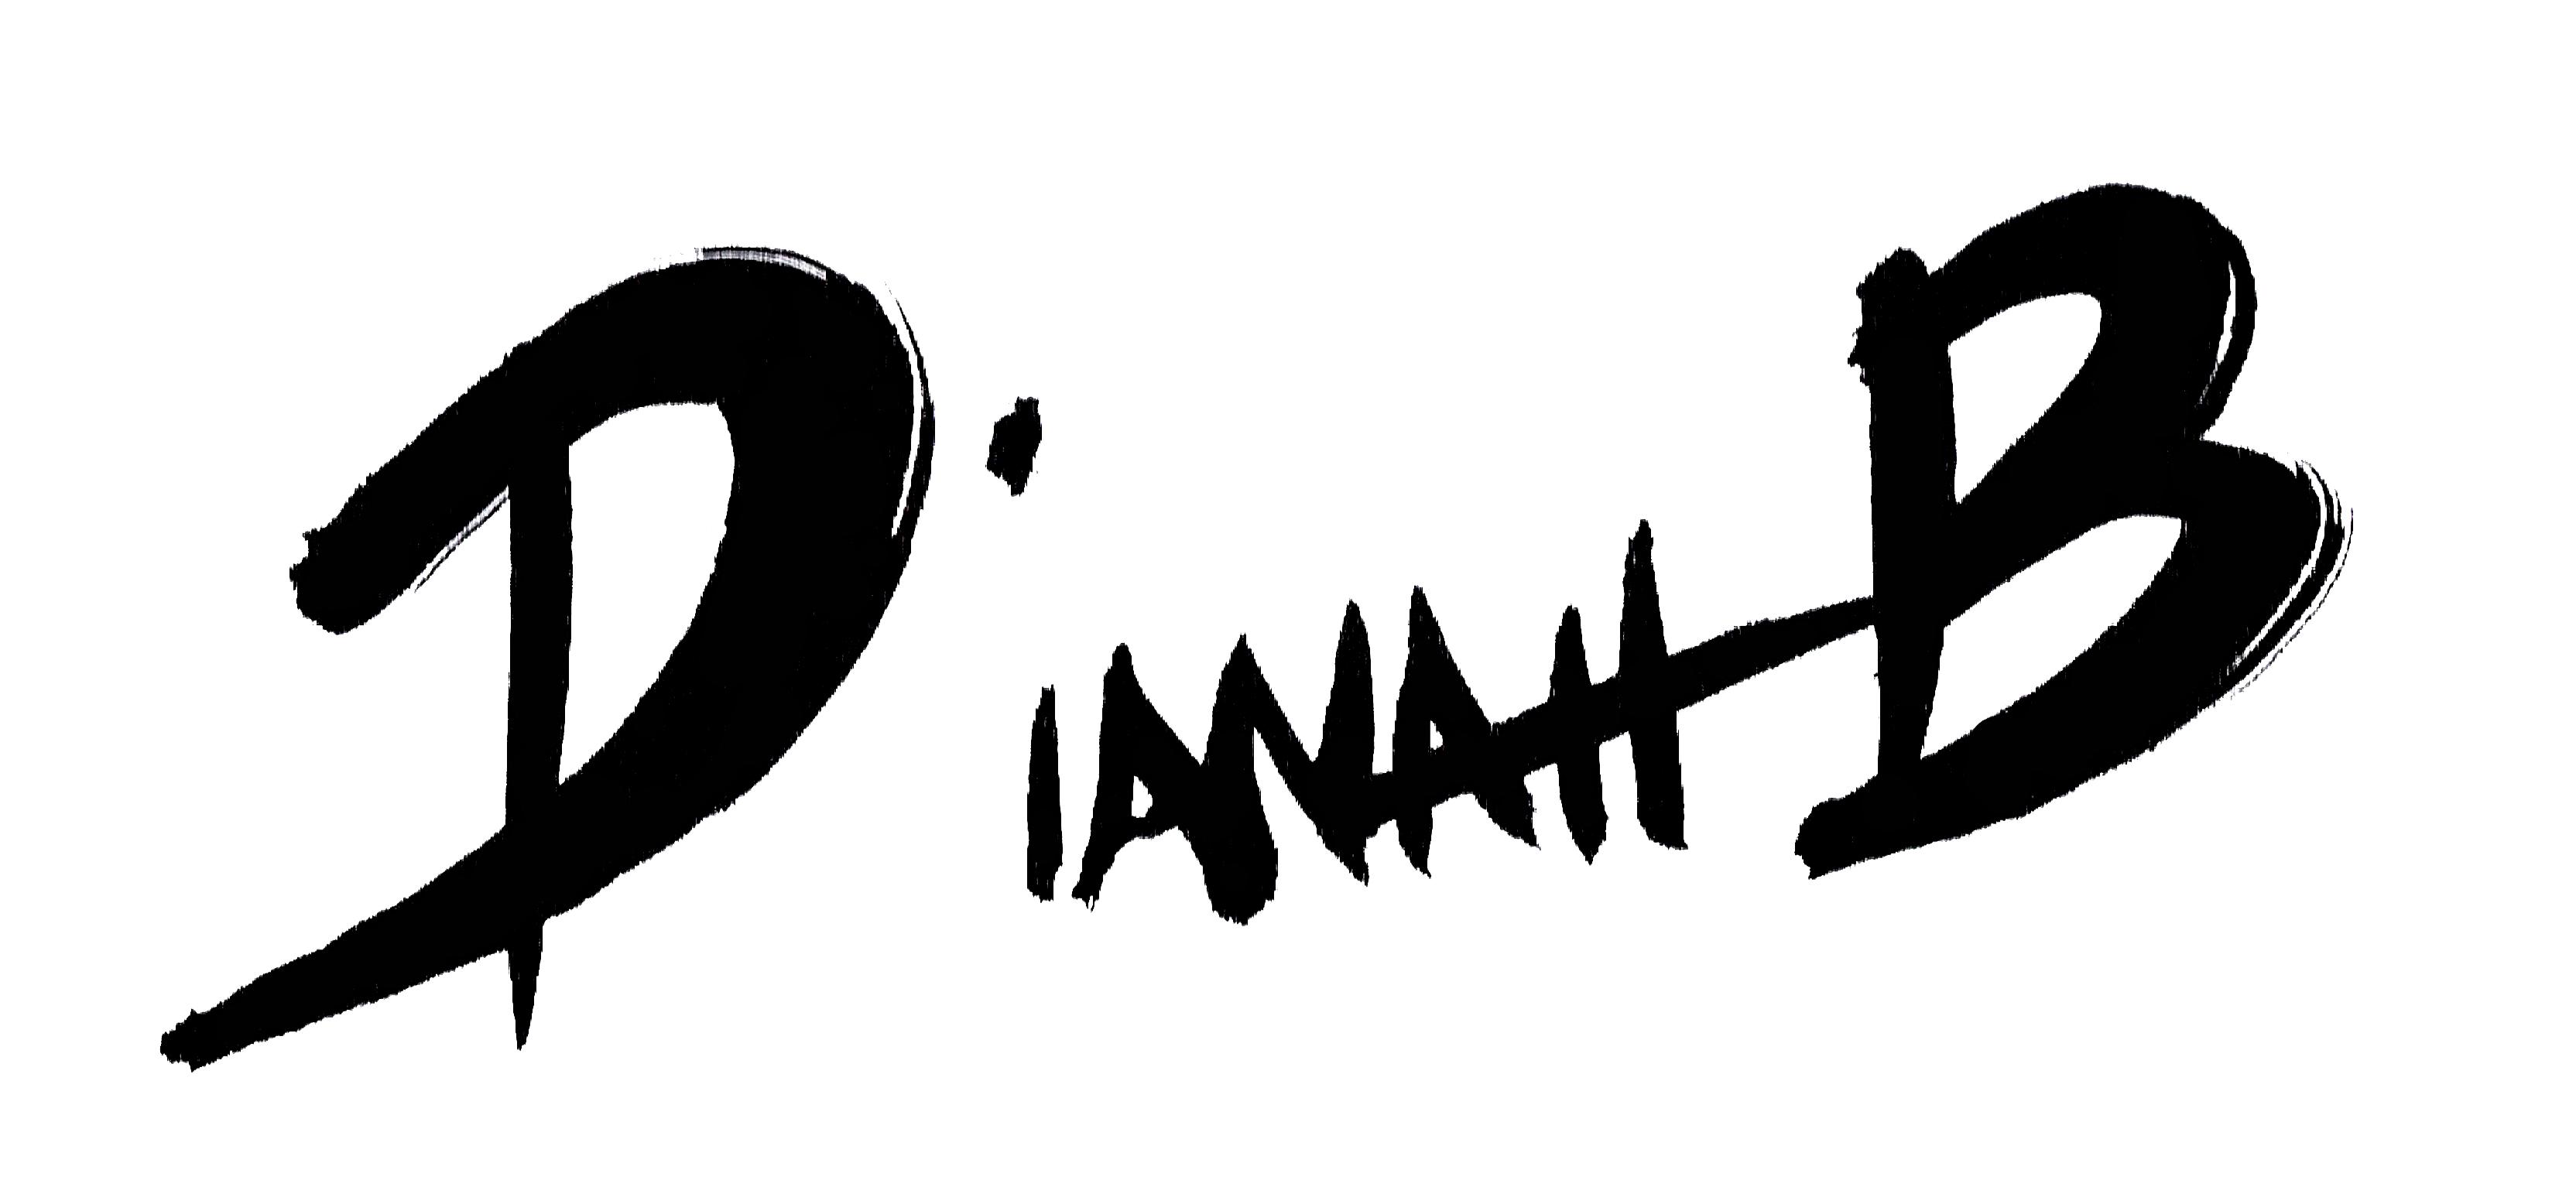 Dianah B. Arts Signature